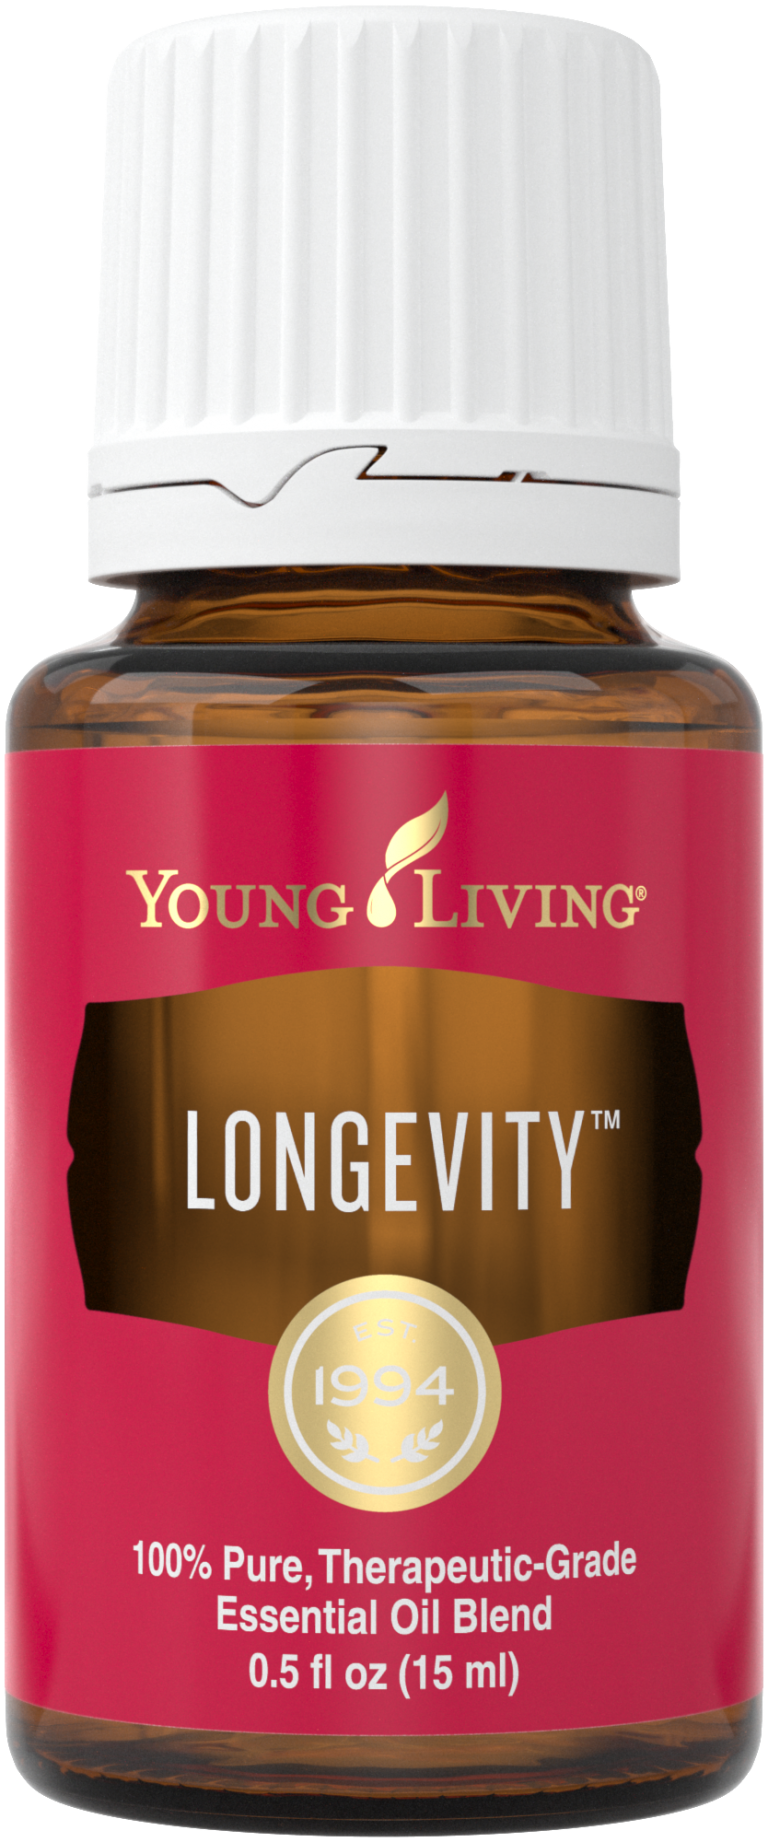 longevity_15ml_silo_us_2016_23900378203_o